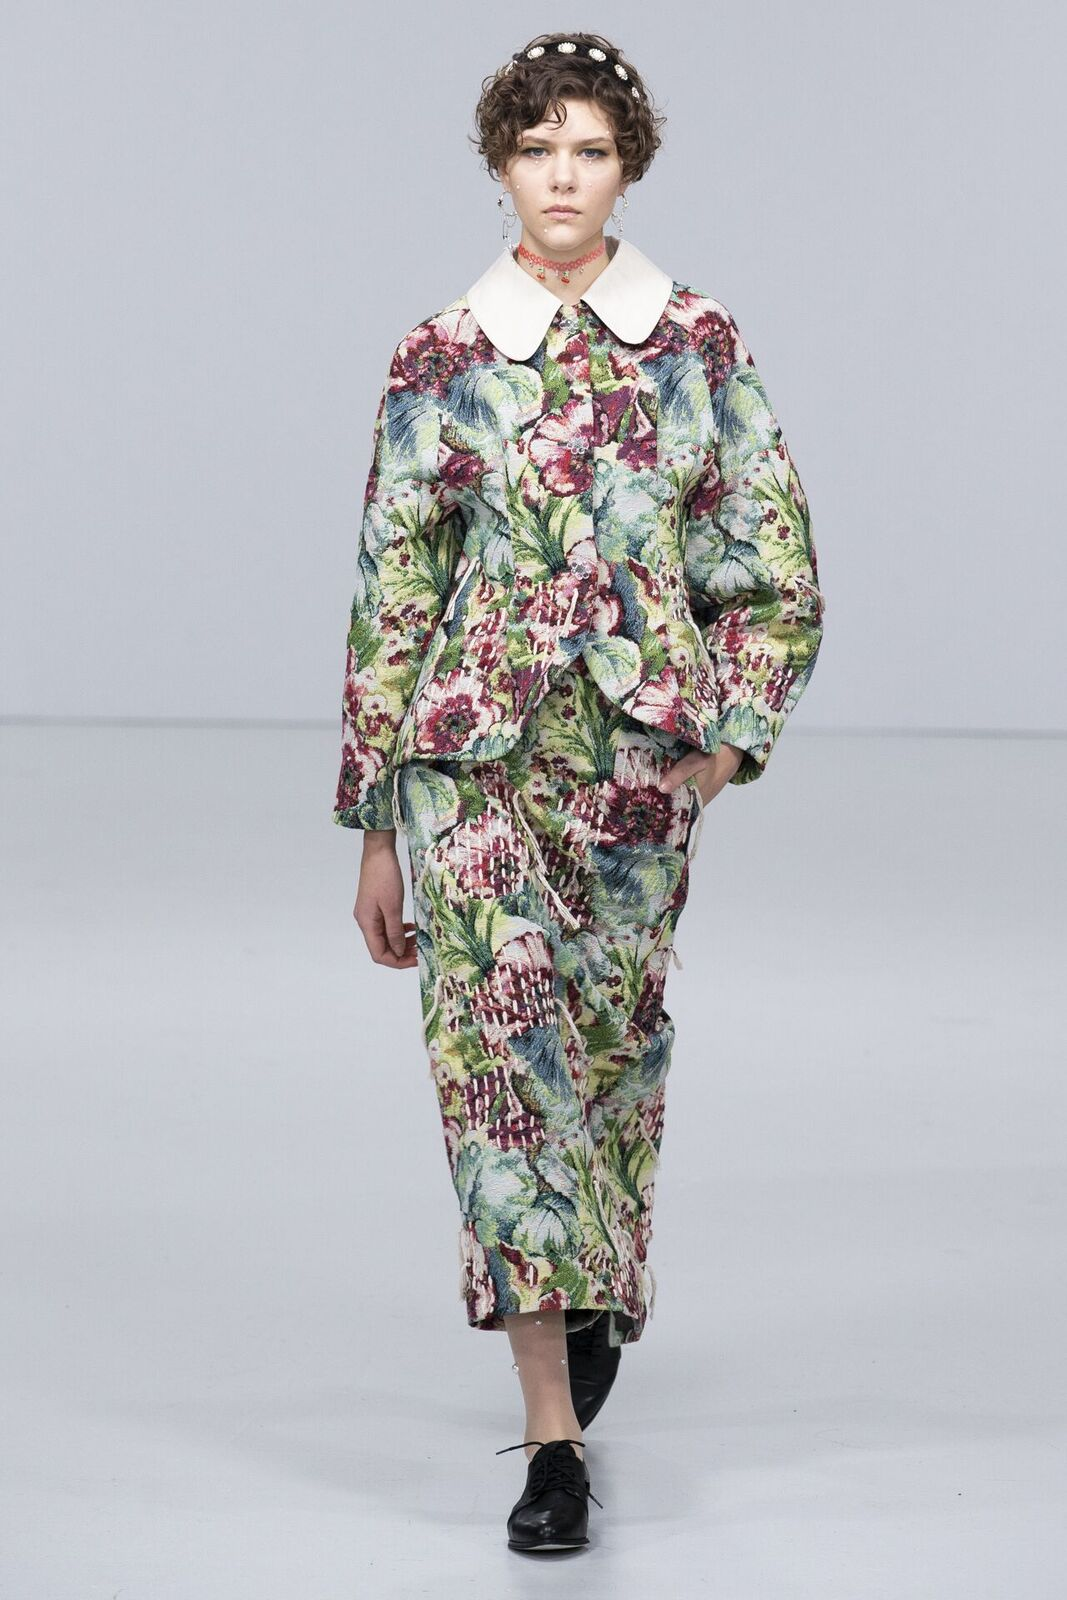 Refuse club post aw 20 london fashion week feature! (2)